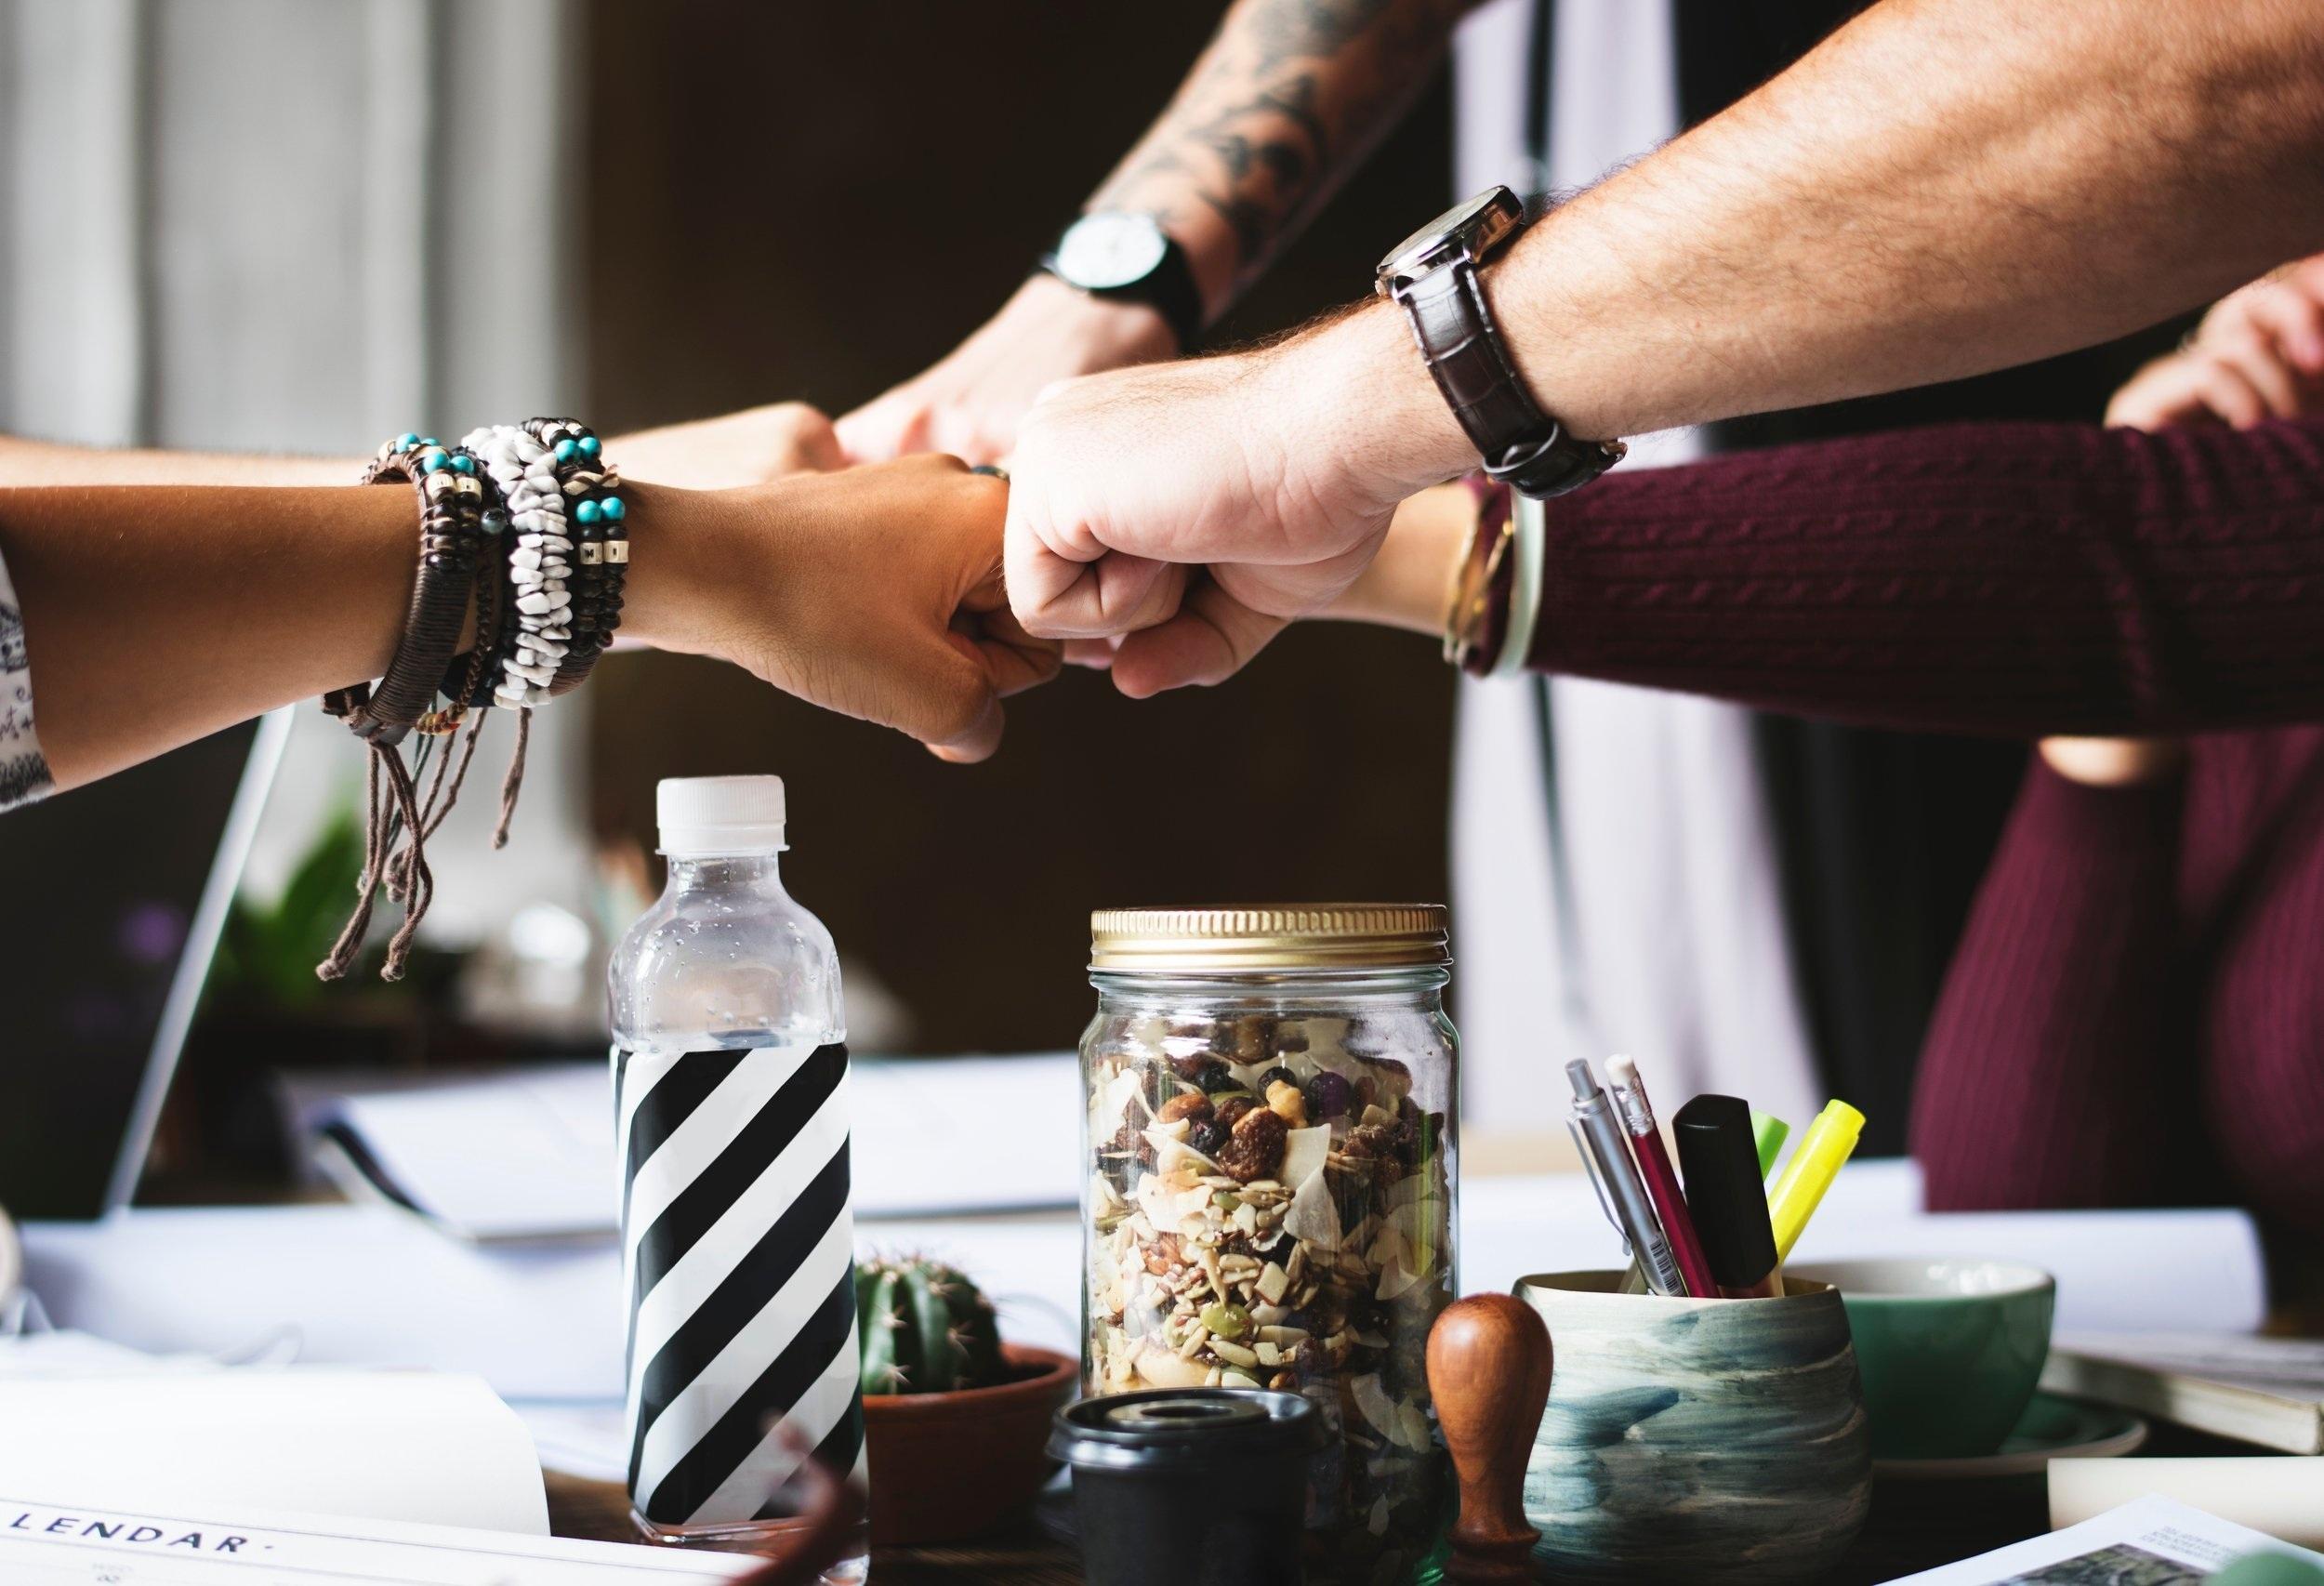 Team Building & Conflict Management